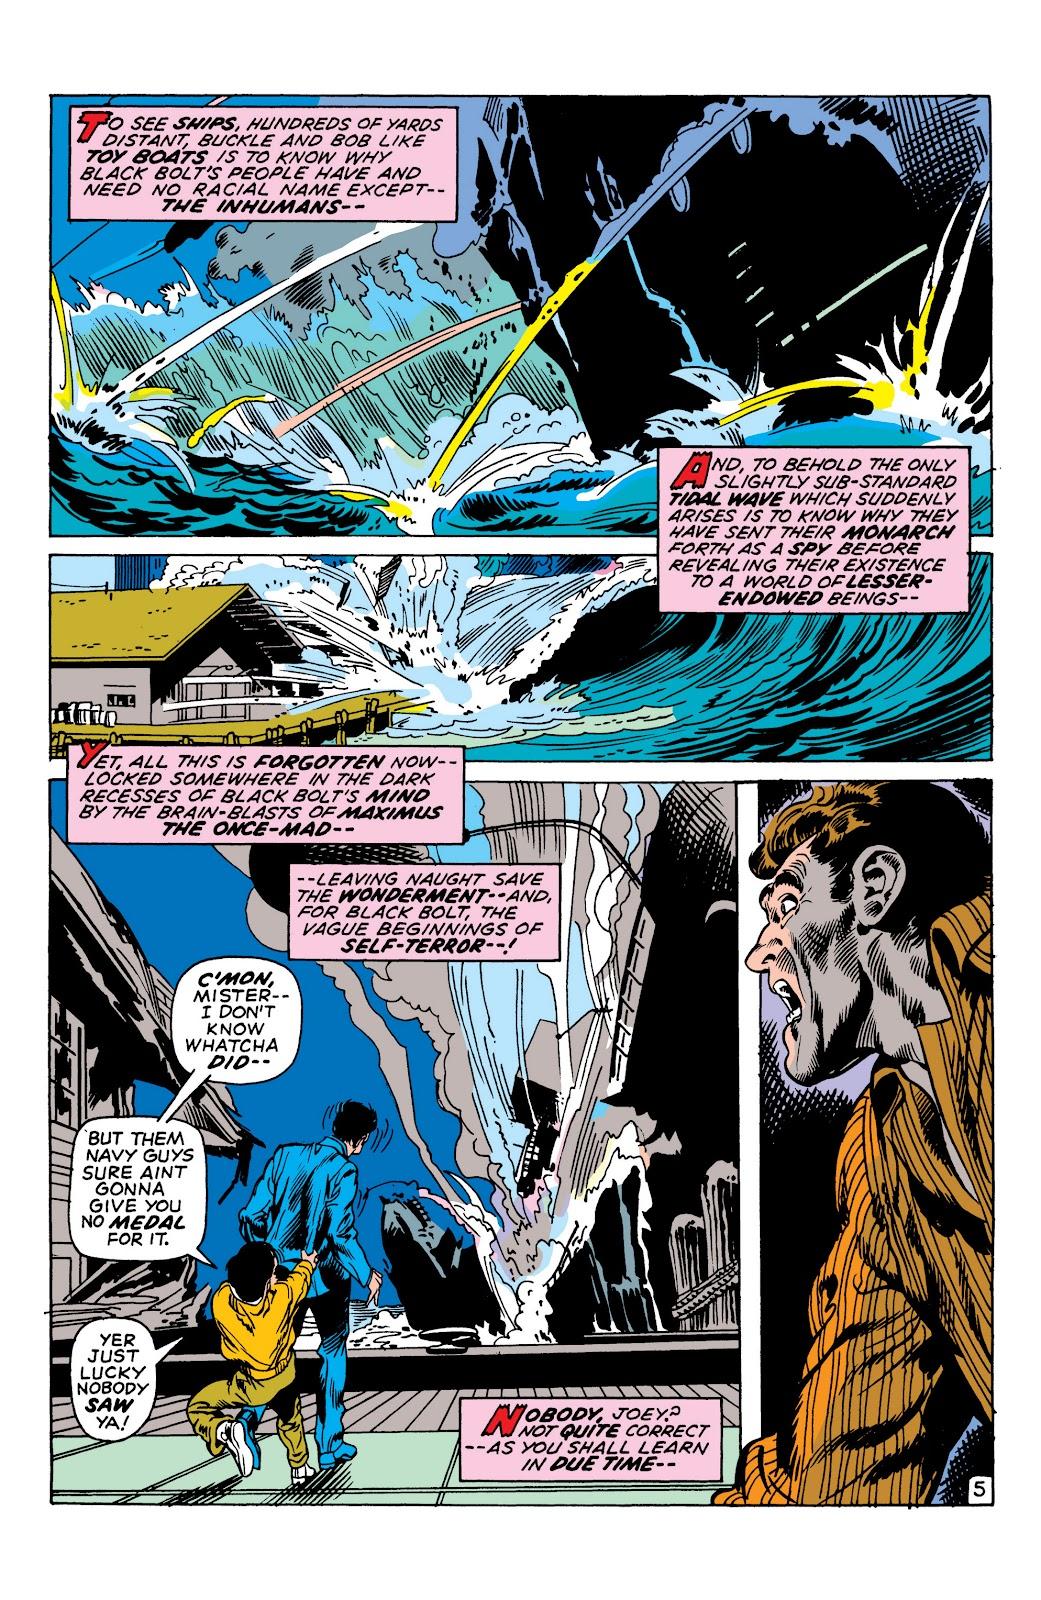 Read online Marvel Masterworks: The Inhumans comic -  Issue # TPB 1 (Part 2) - 29